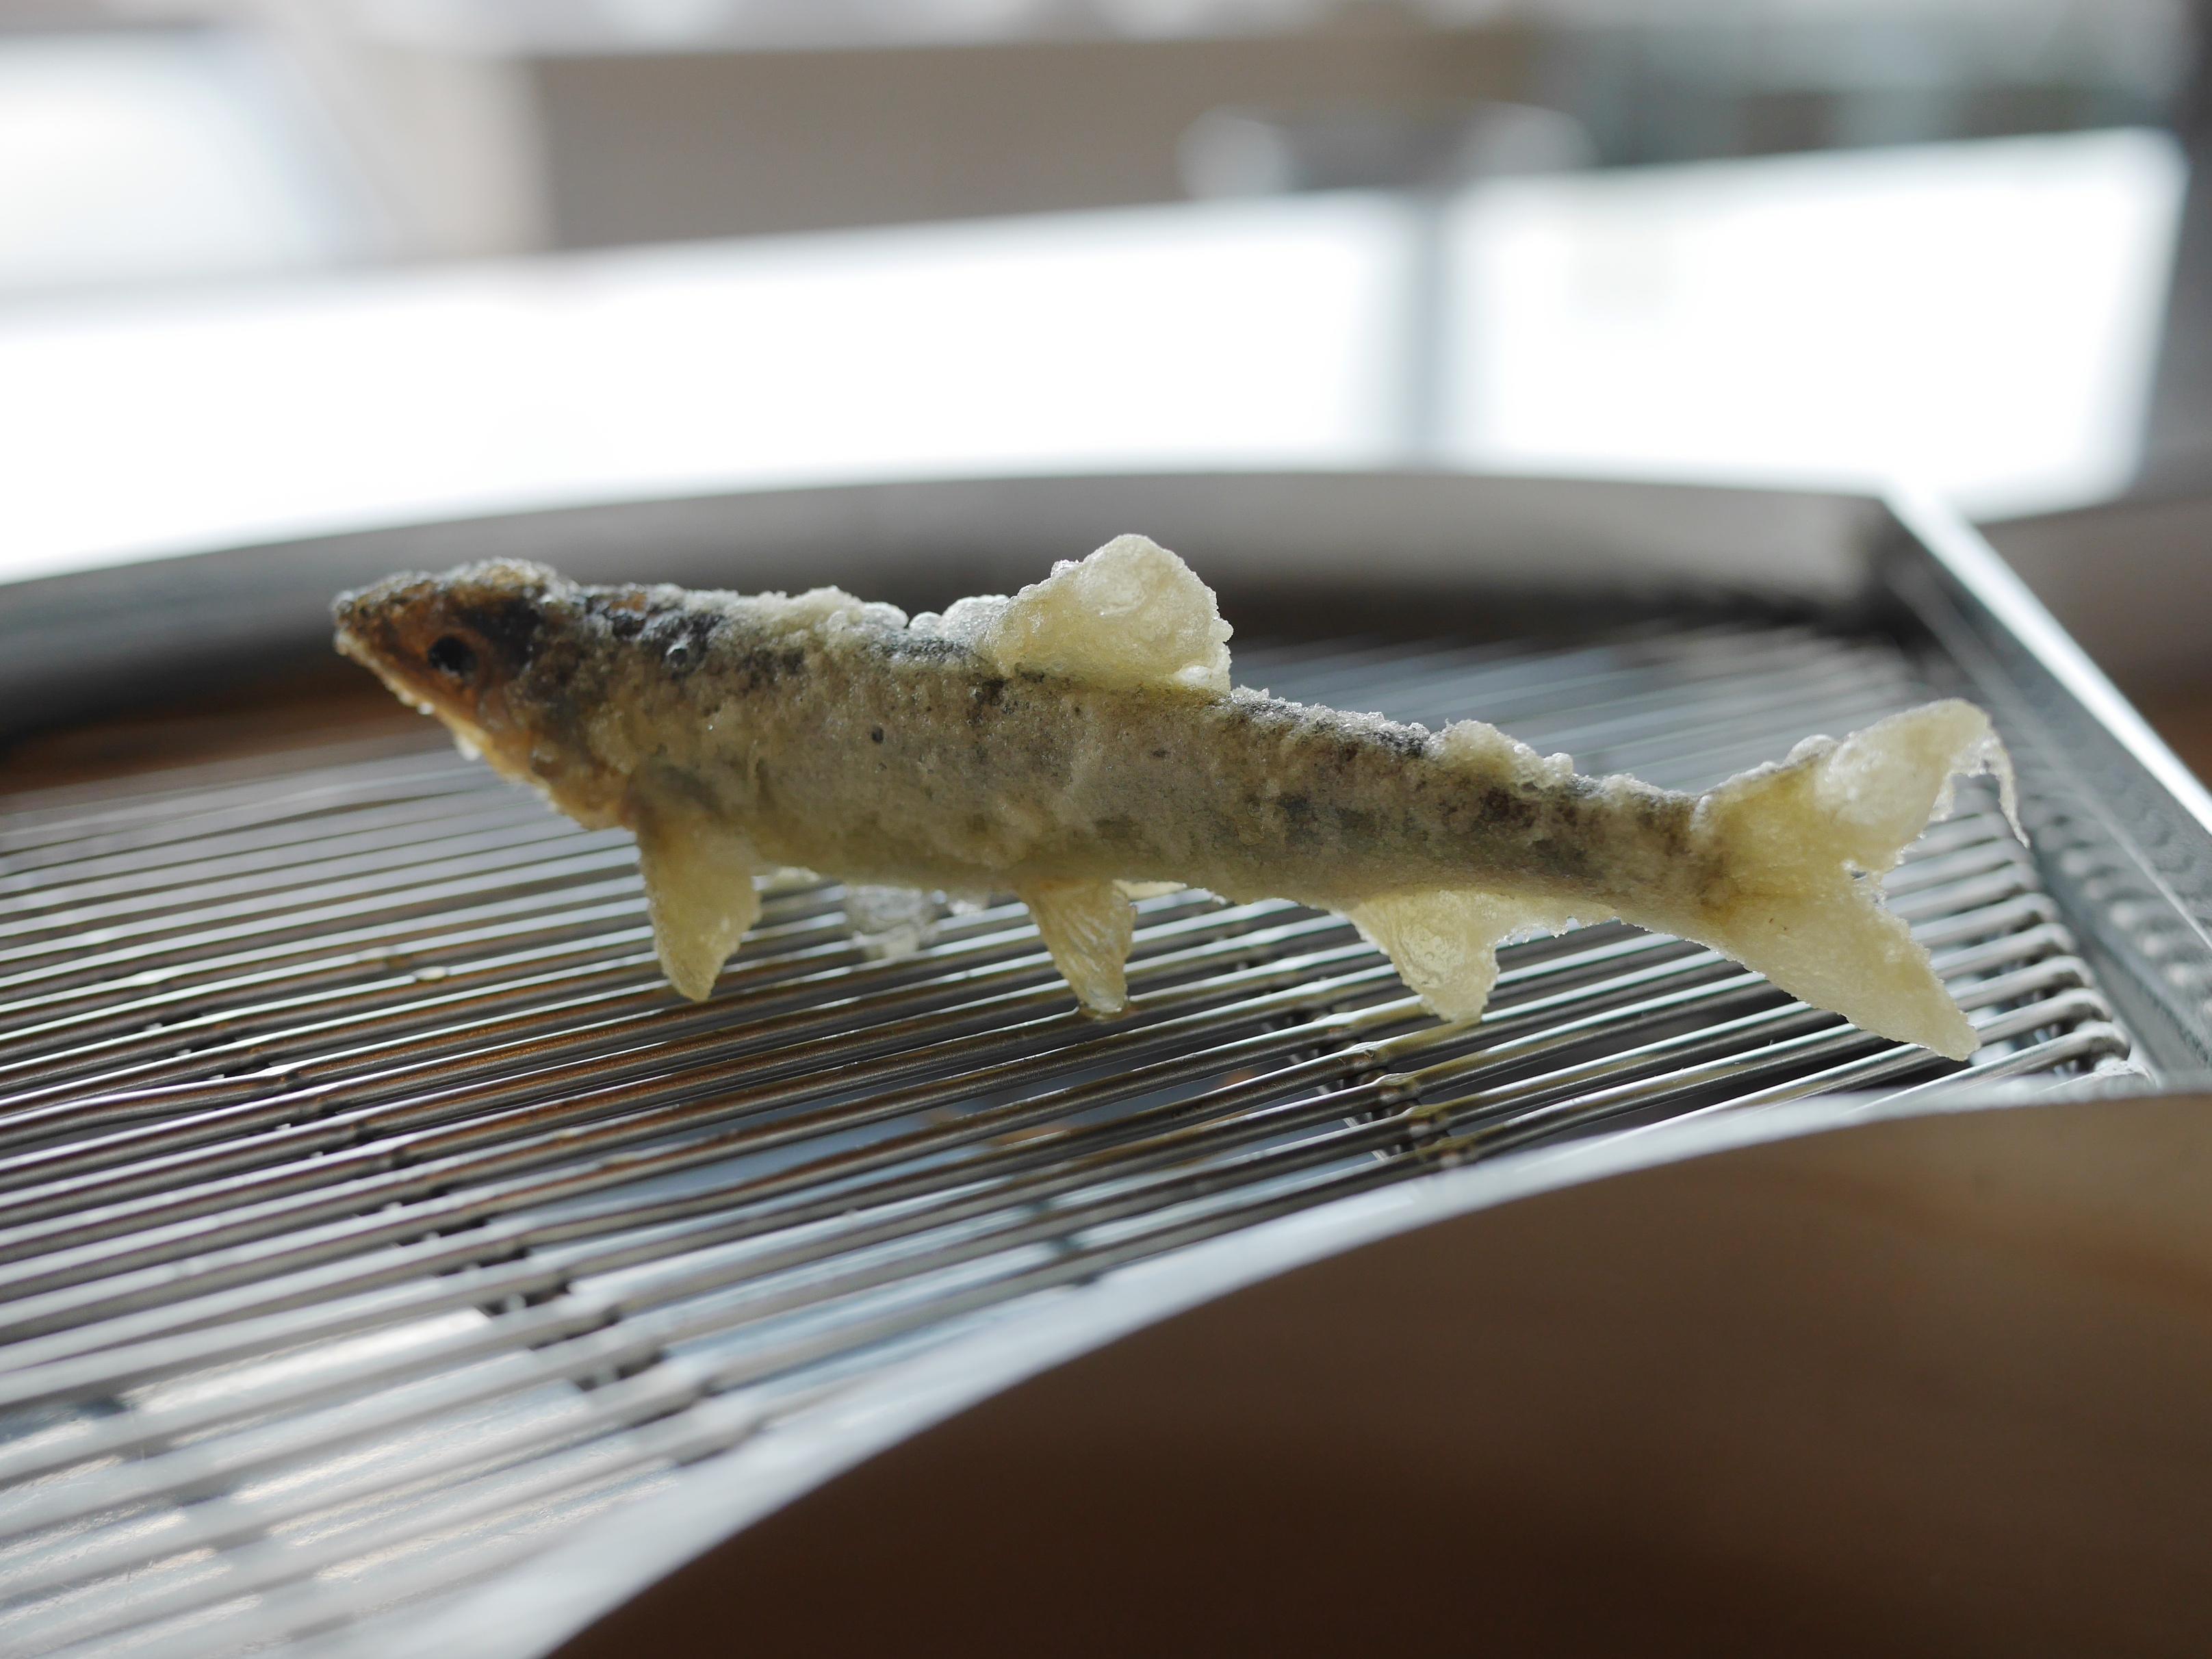 Delicate fish tempura skillfully deep-fried by chef at Tempura Yamanoue